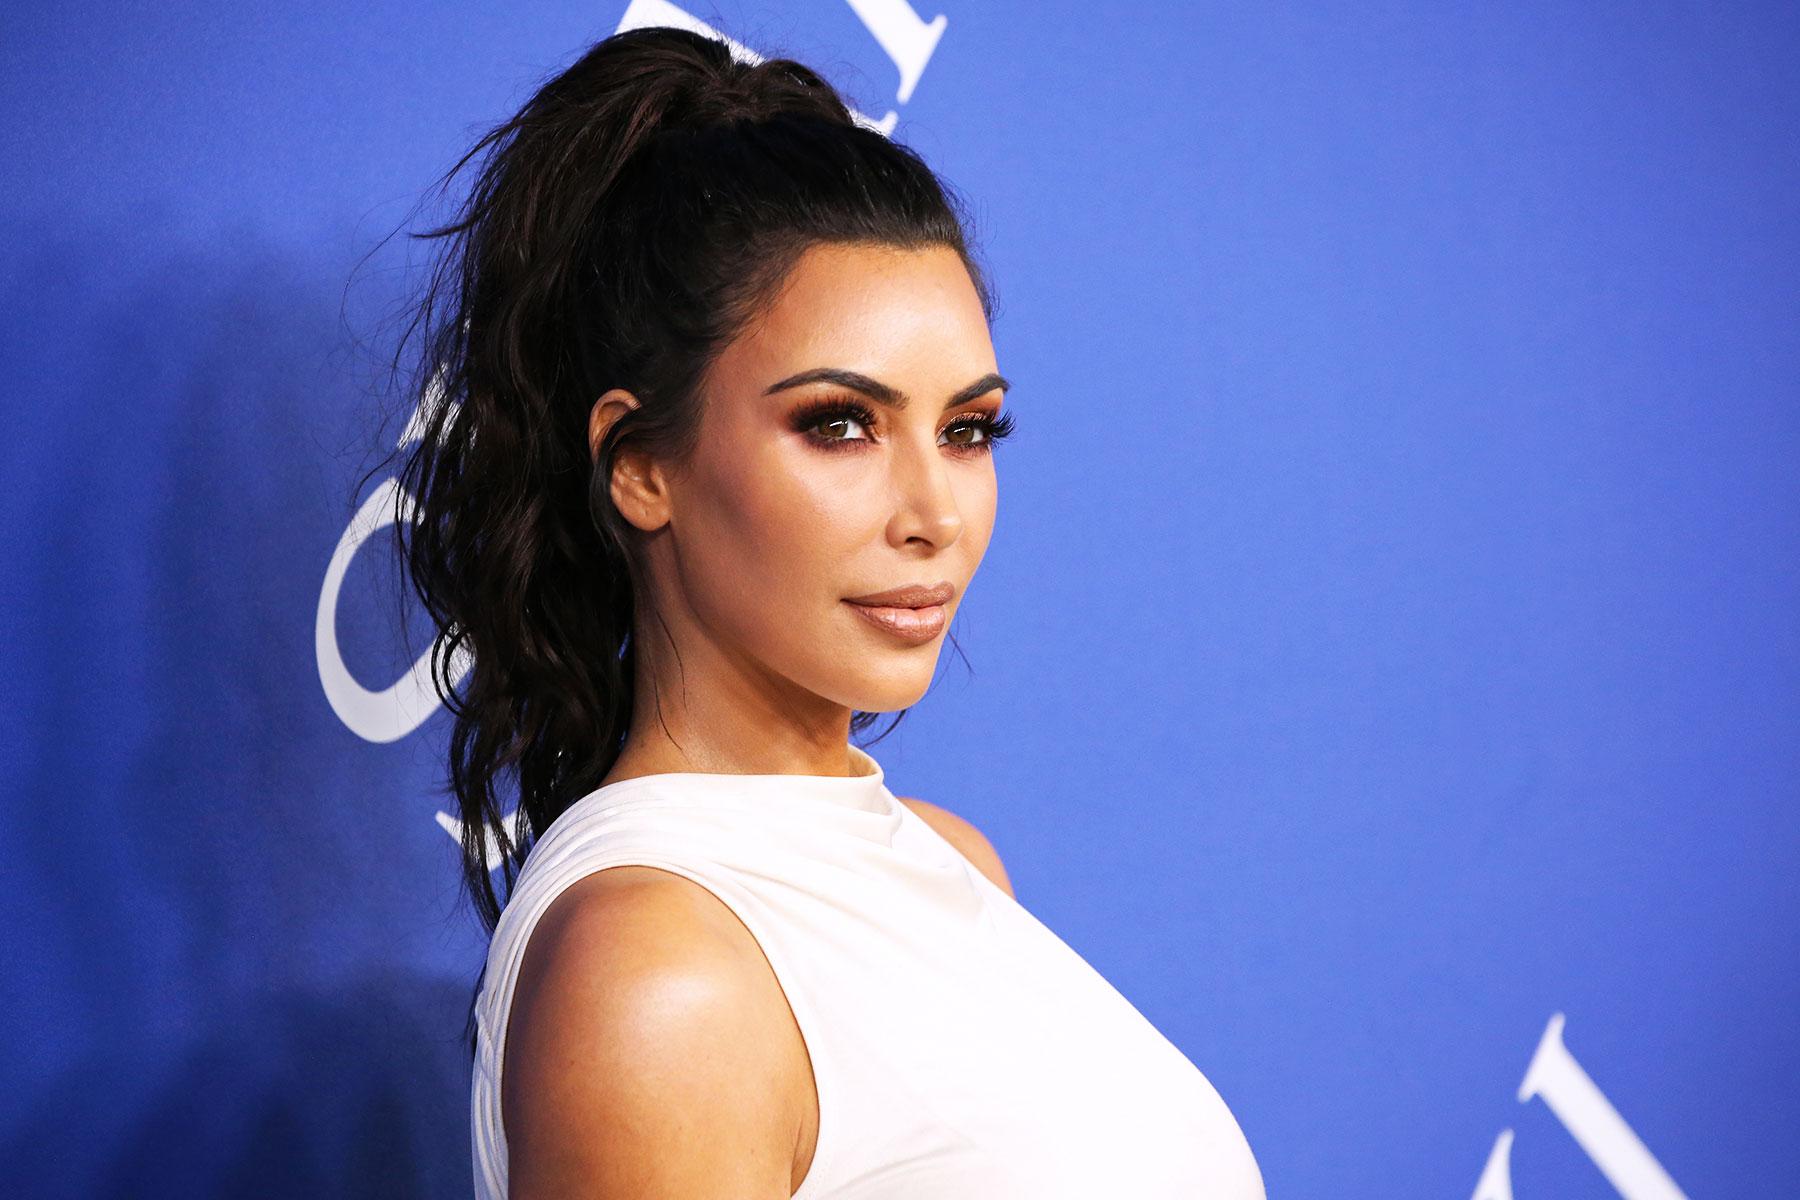 Kim Kardashian Prison Reform Advocate Takes On New Case Rolling